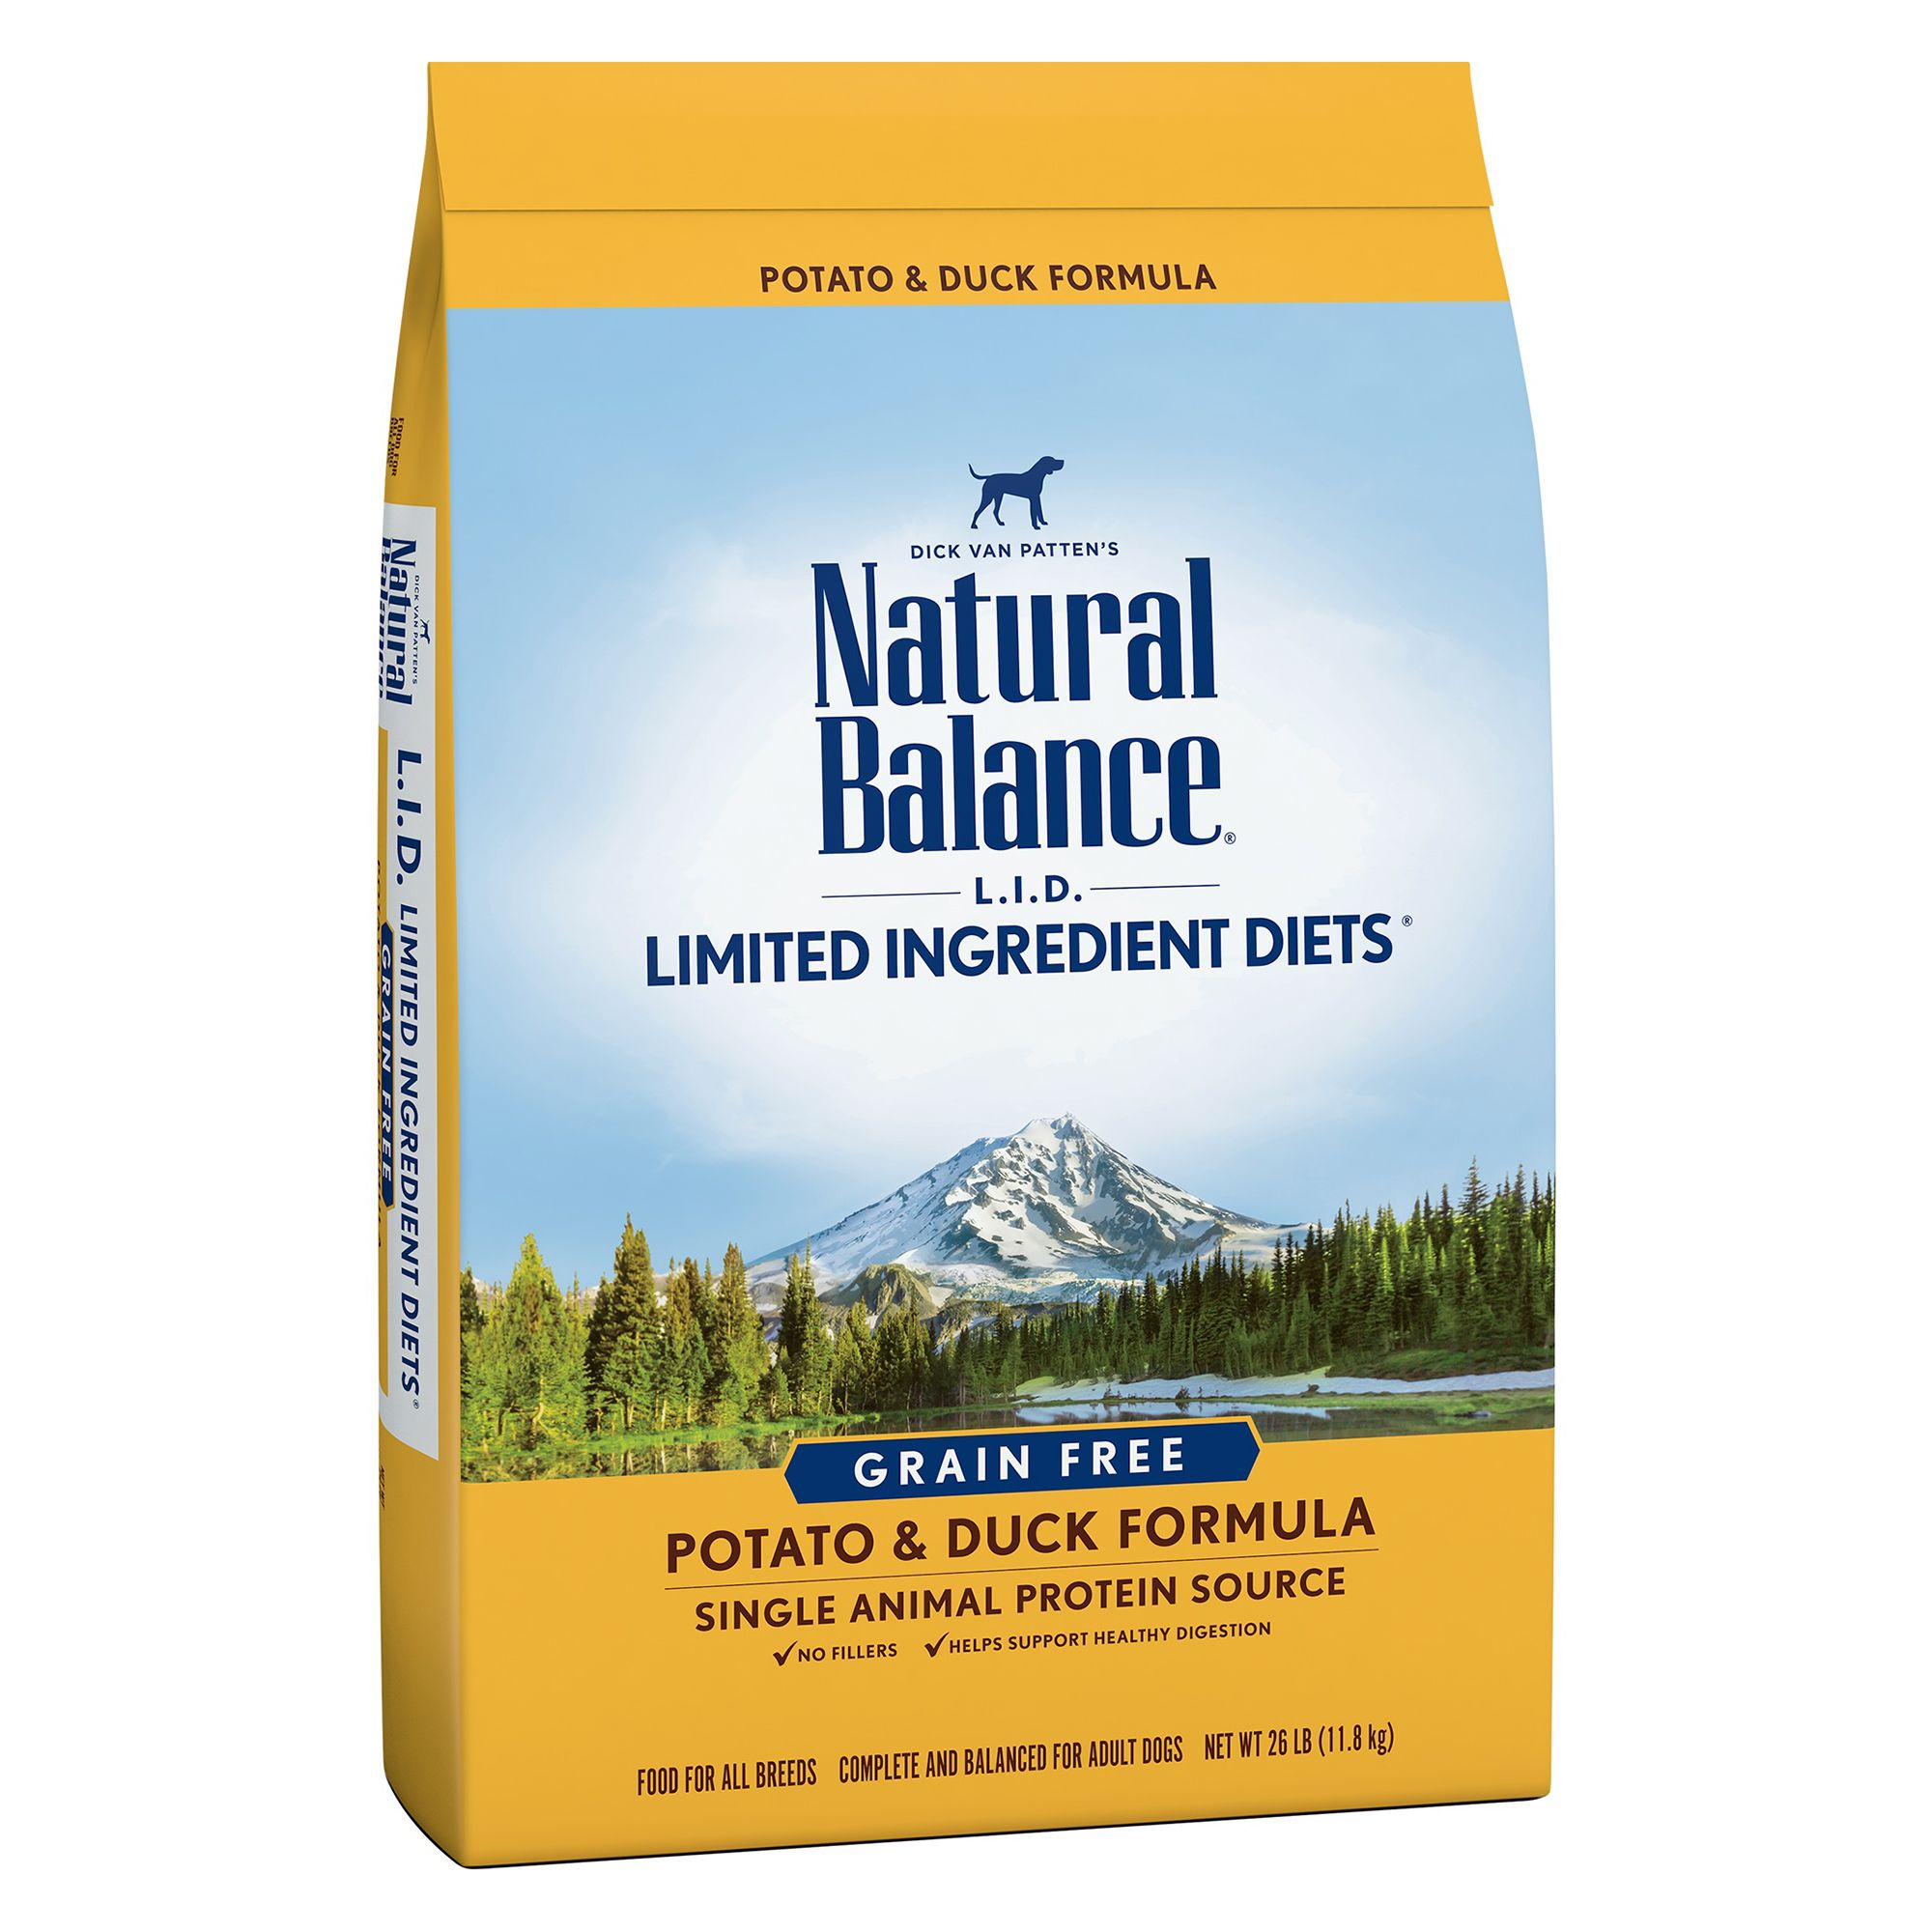 Natural Balance Dry Dog Food Grain Free Limited Ingredient